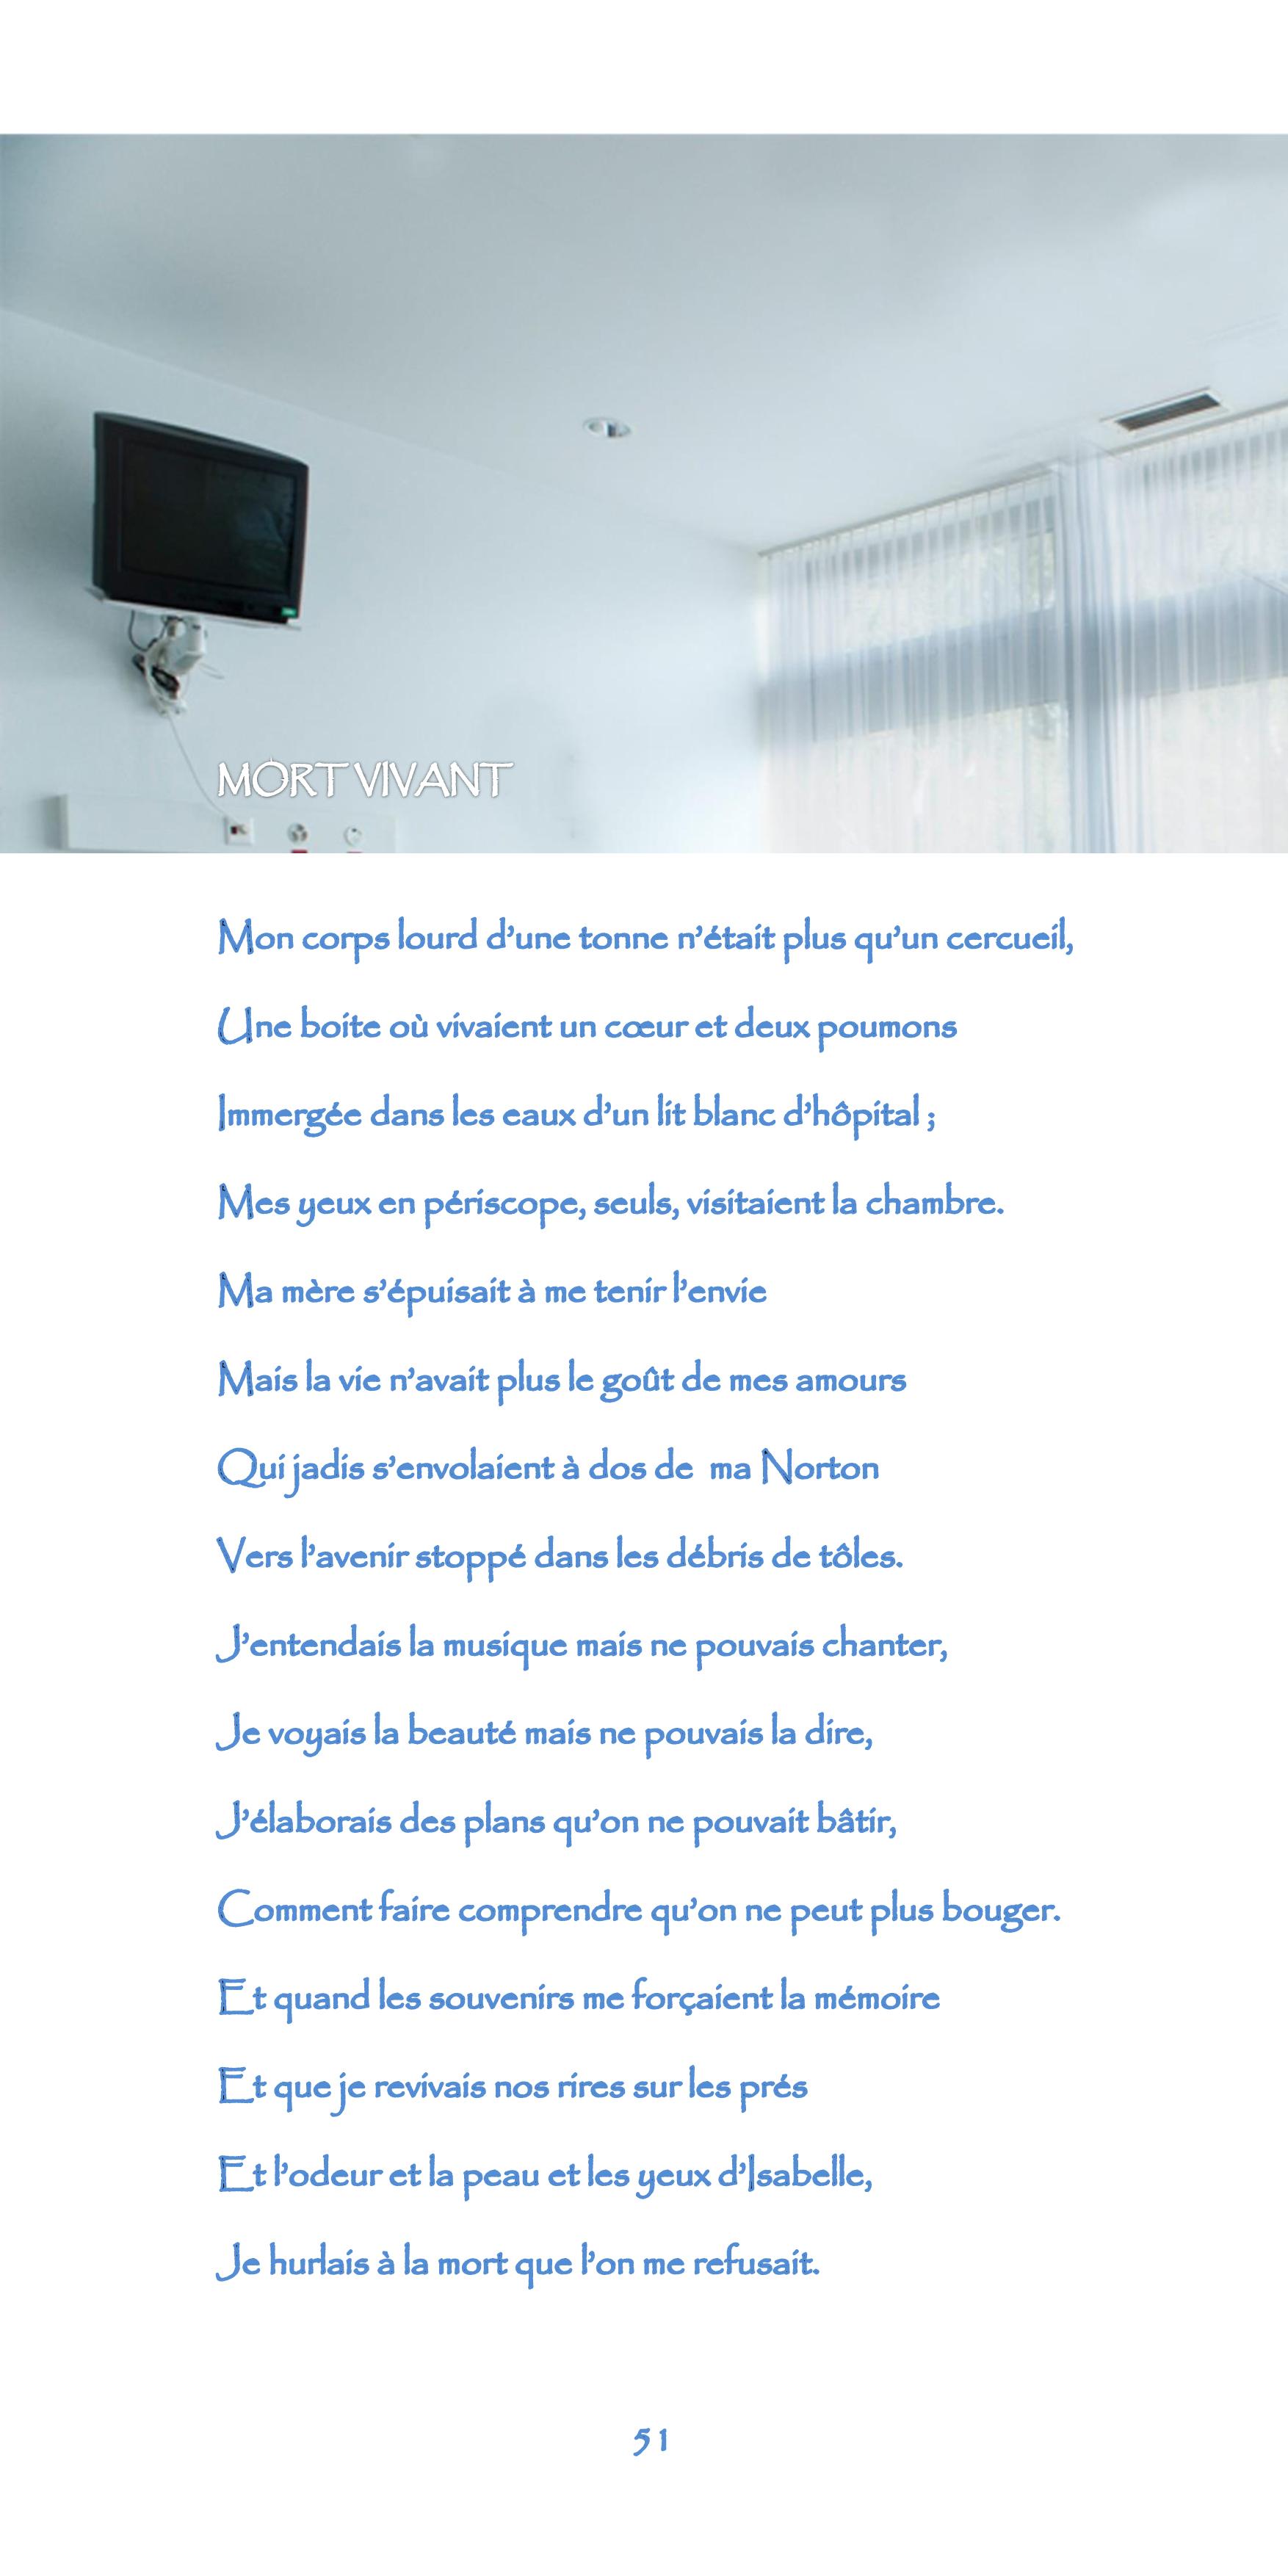 51-nègre bleu-mort vivant.jpg